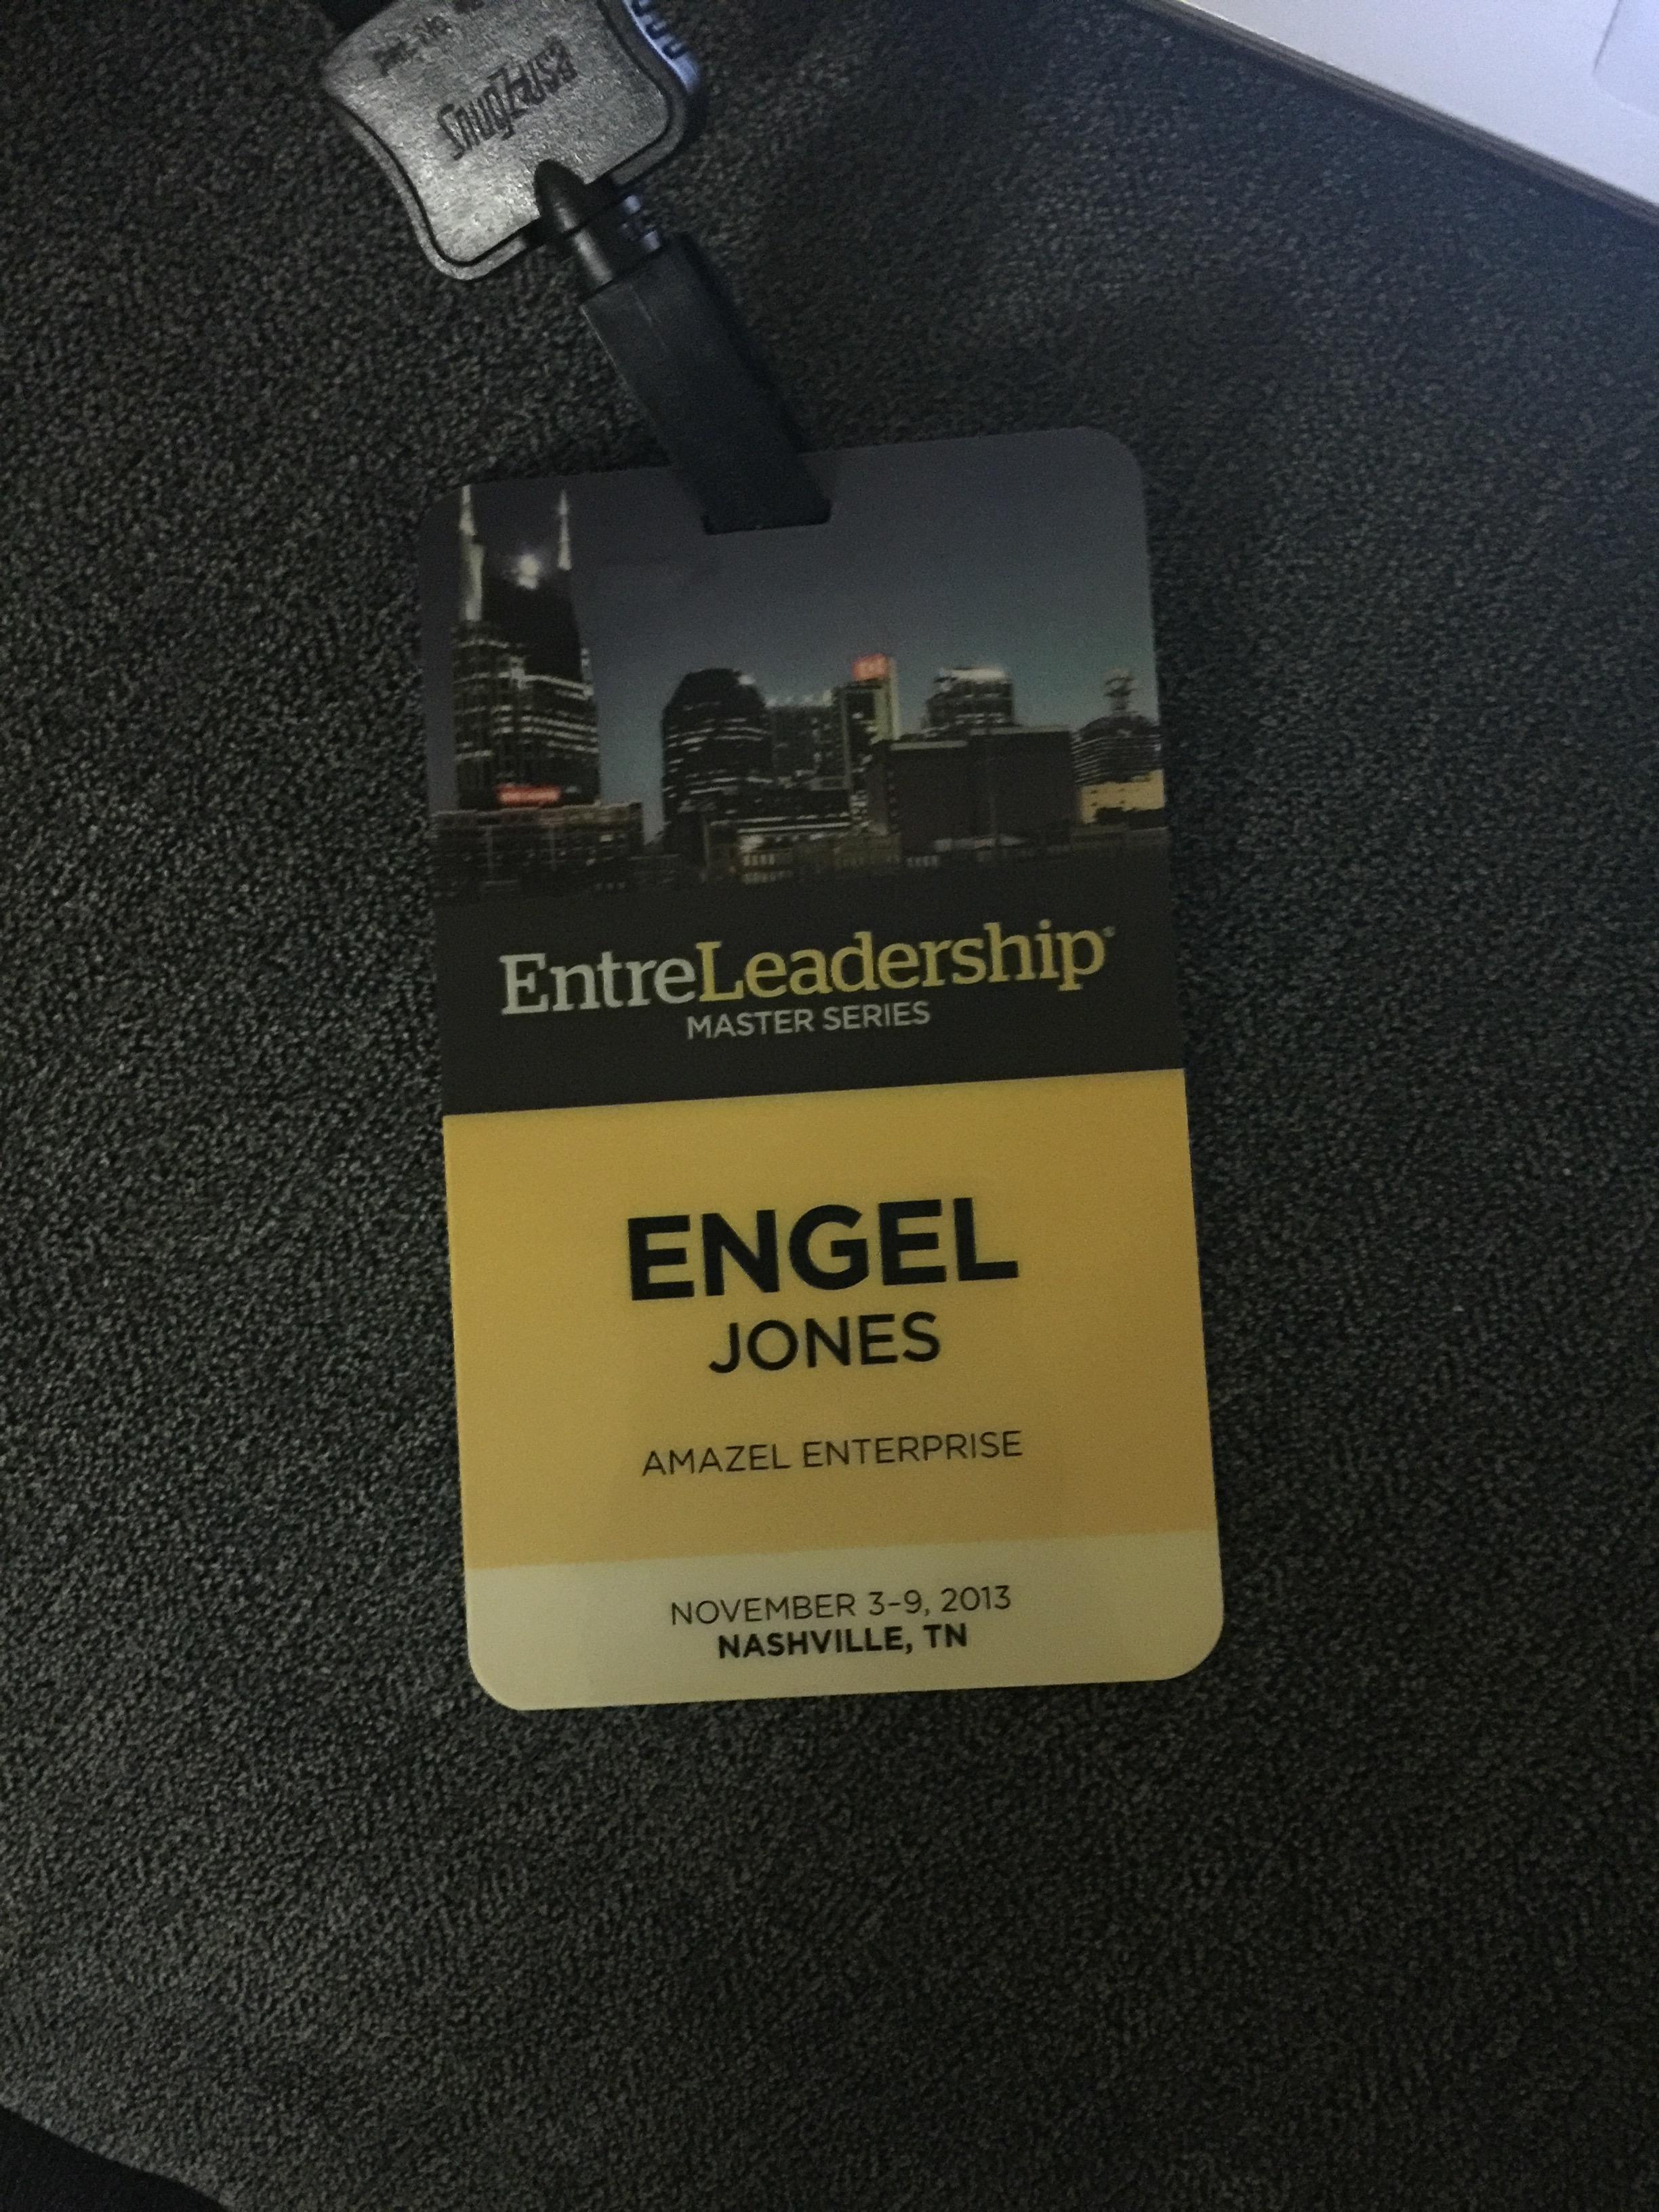 Entreleadership Master Series 2013